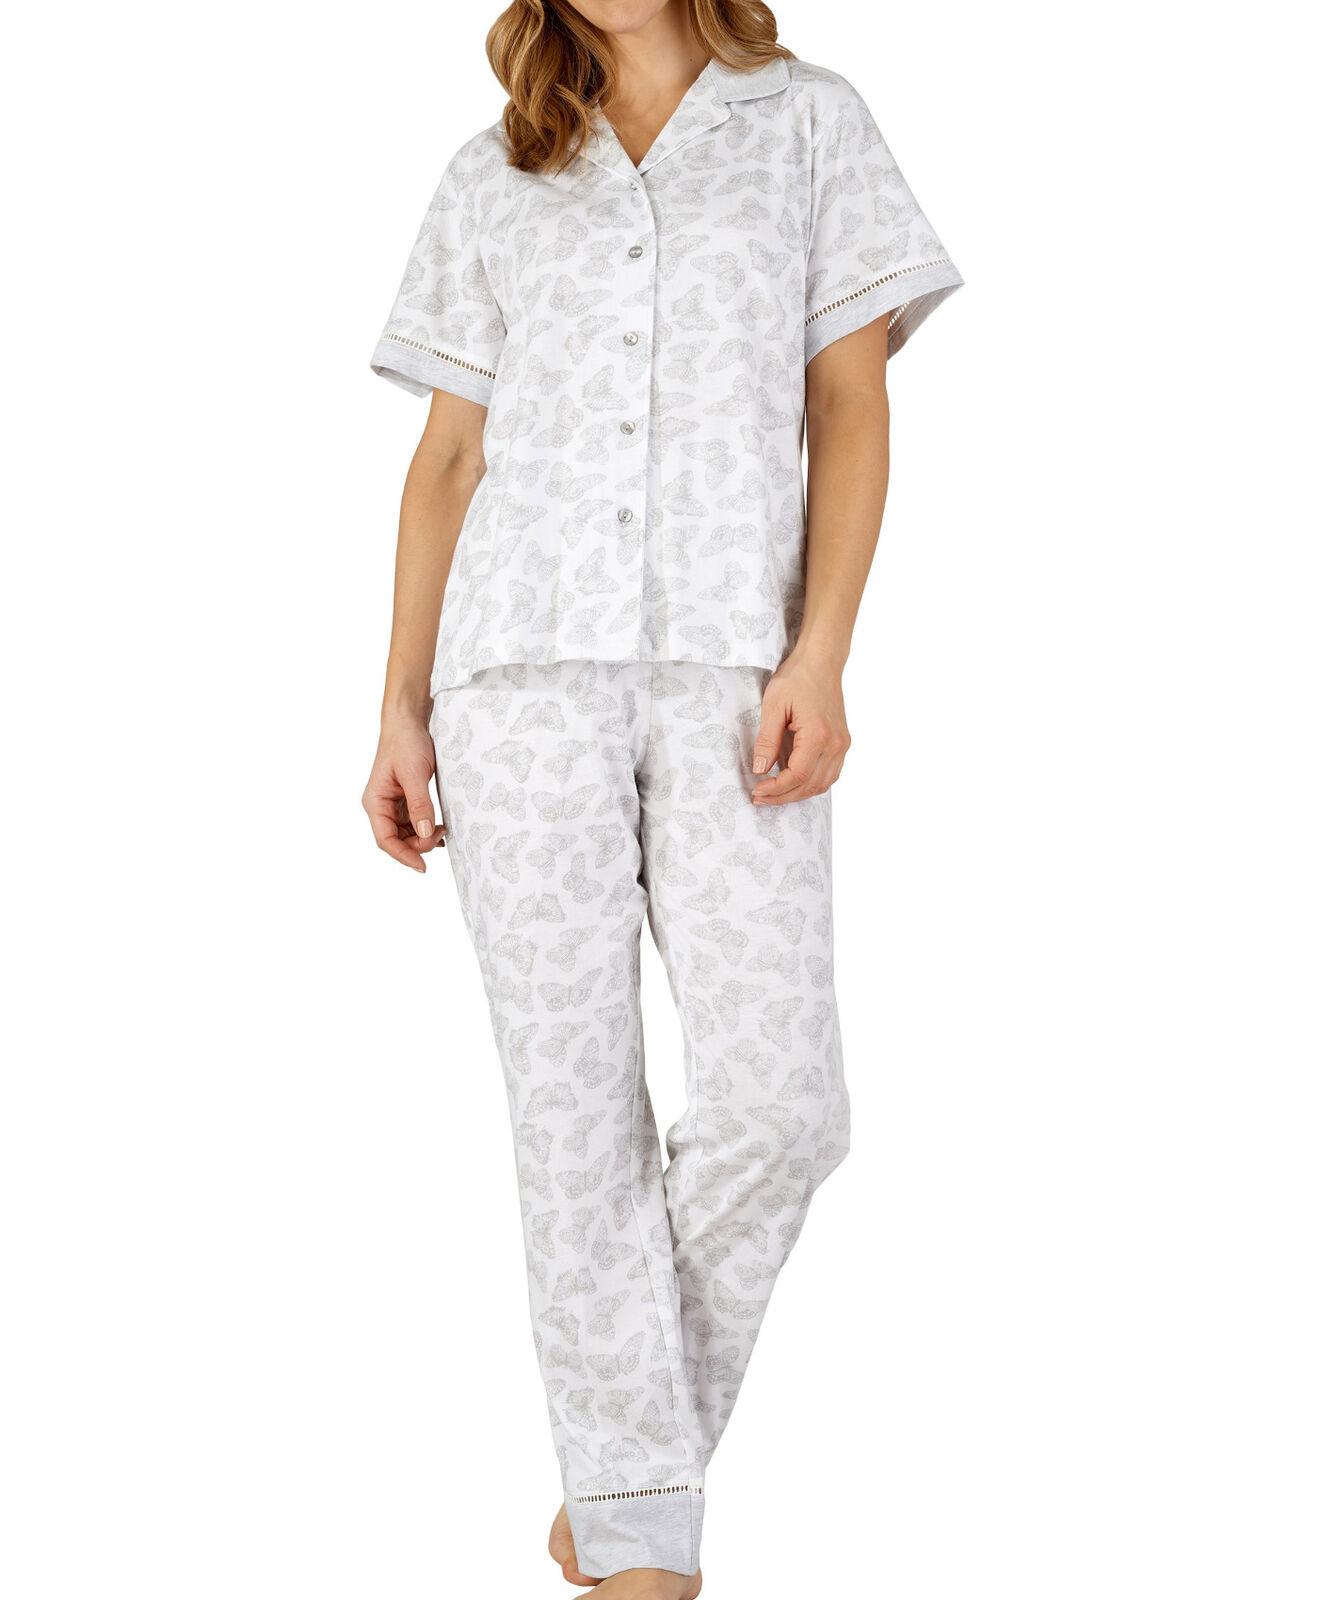 Damas Mariposa Pijama Slenderella Jersey de Algodón Manga Corta a Medida Pijama